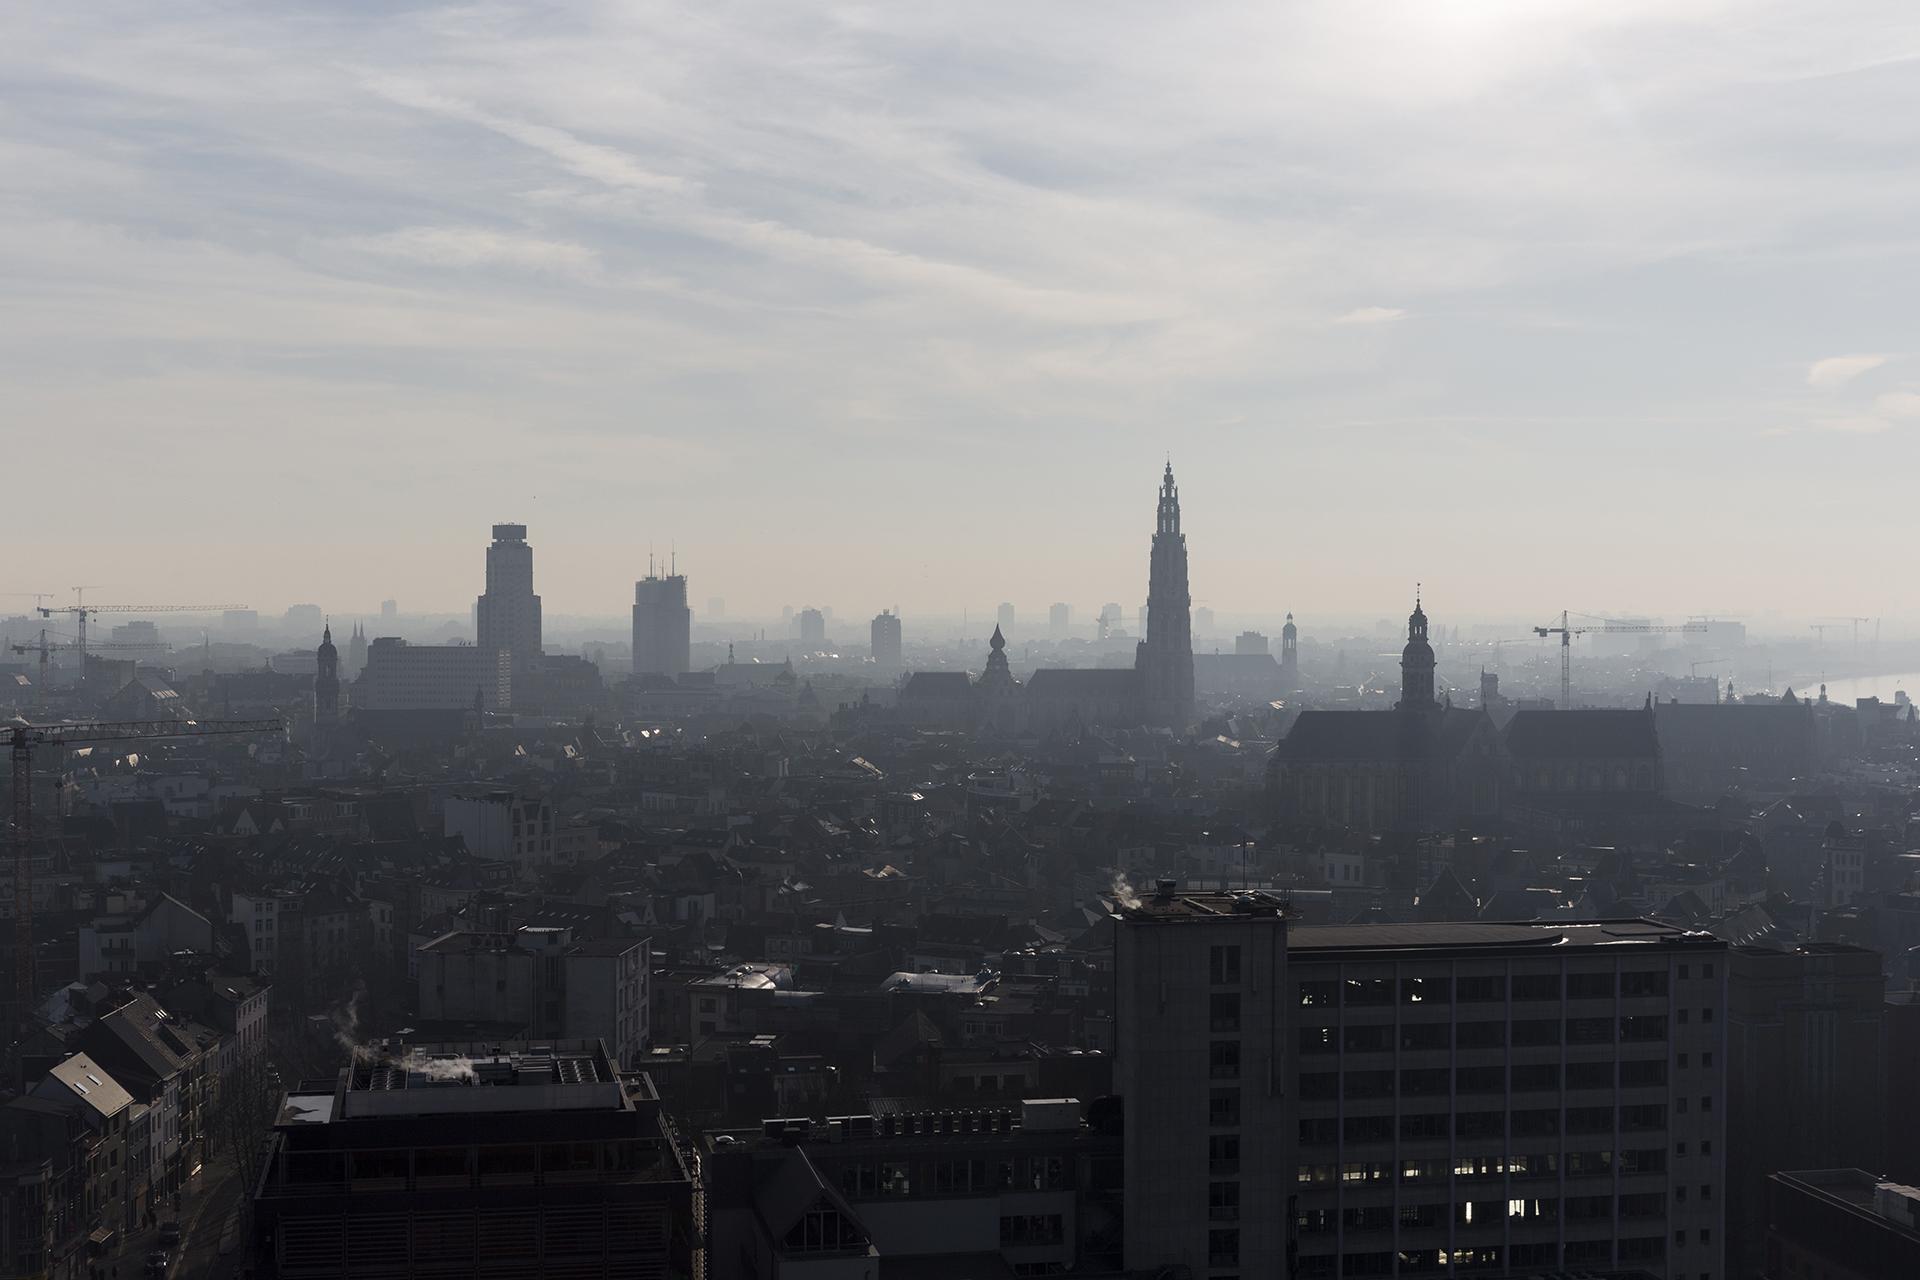 Tim_Allen-Antwerp-07.jpg